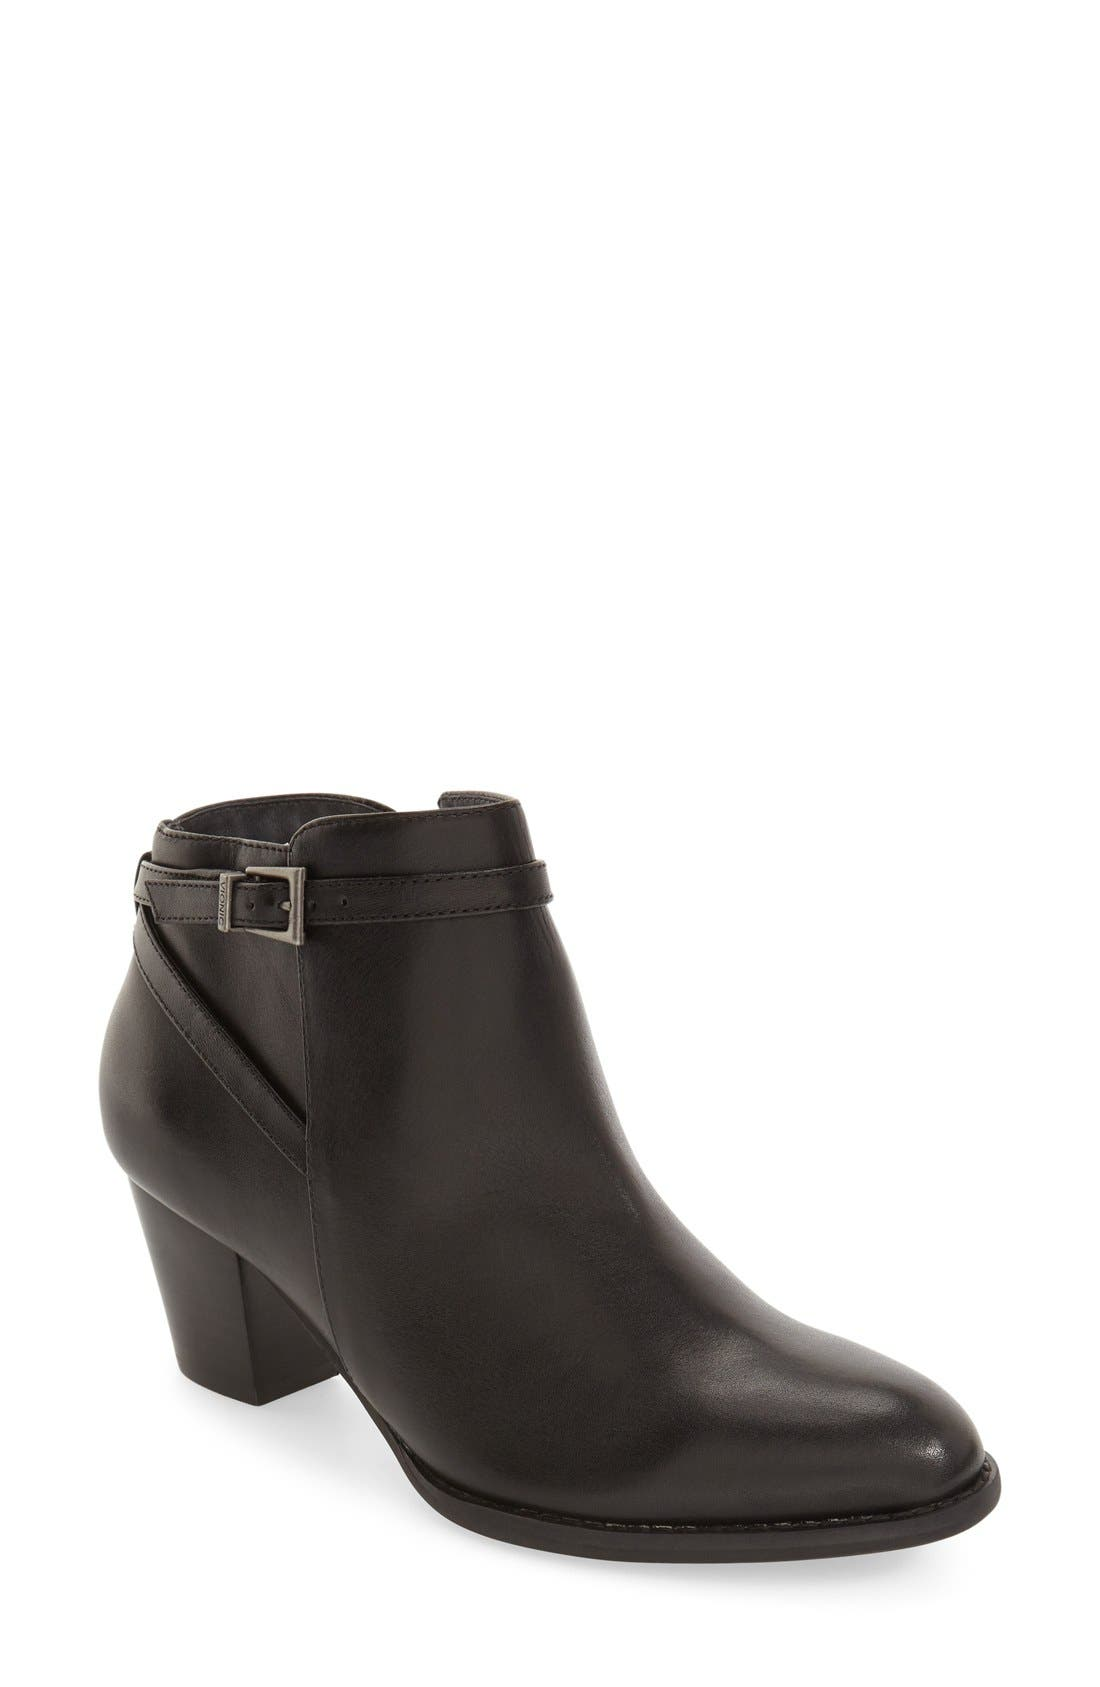 Alternate Image 1 Selected - Vionic 'Upton' Block Heel Boot (Women)